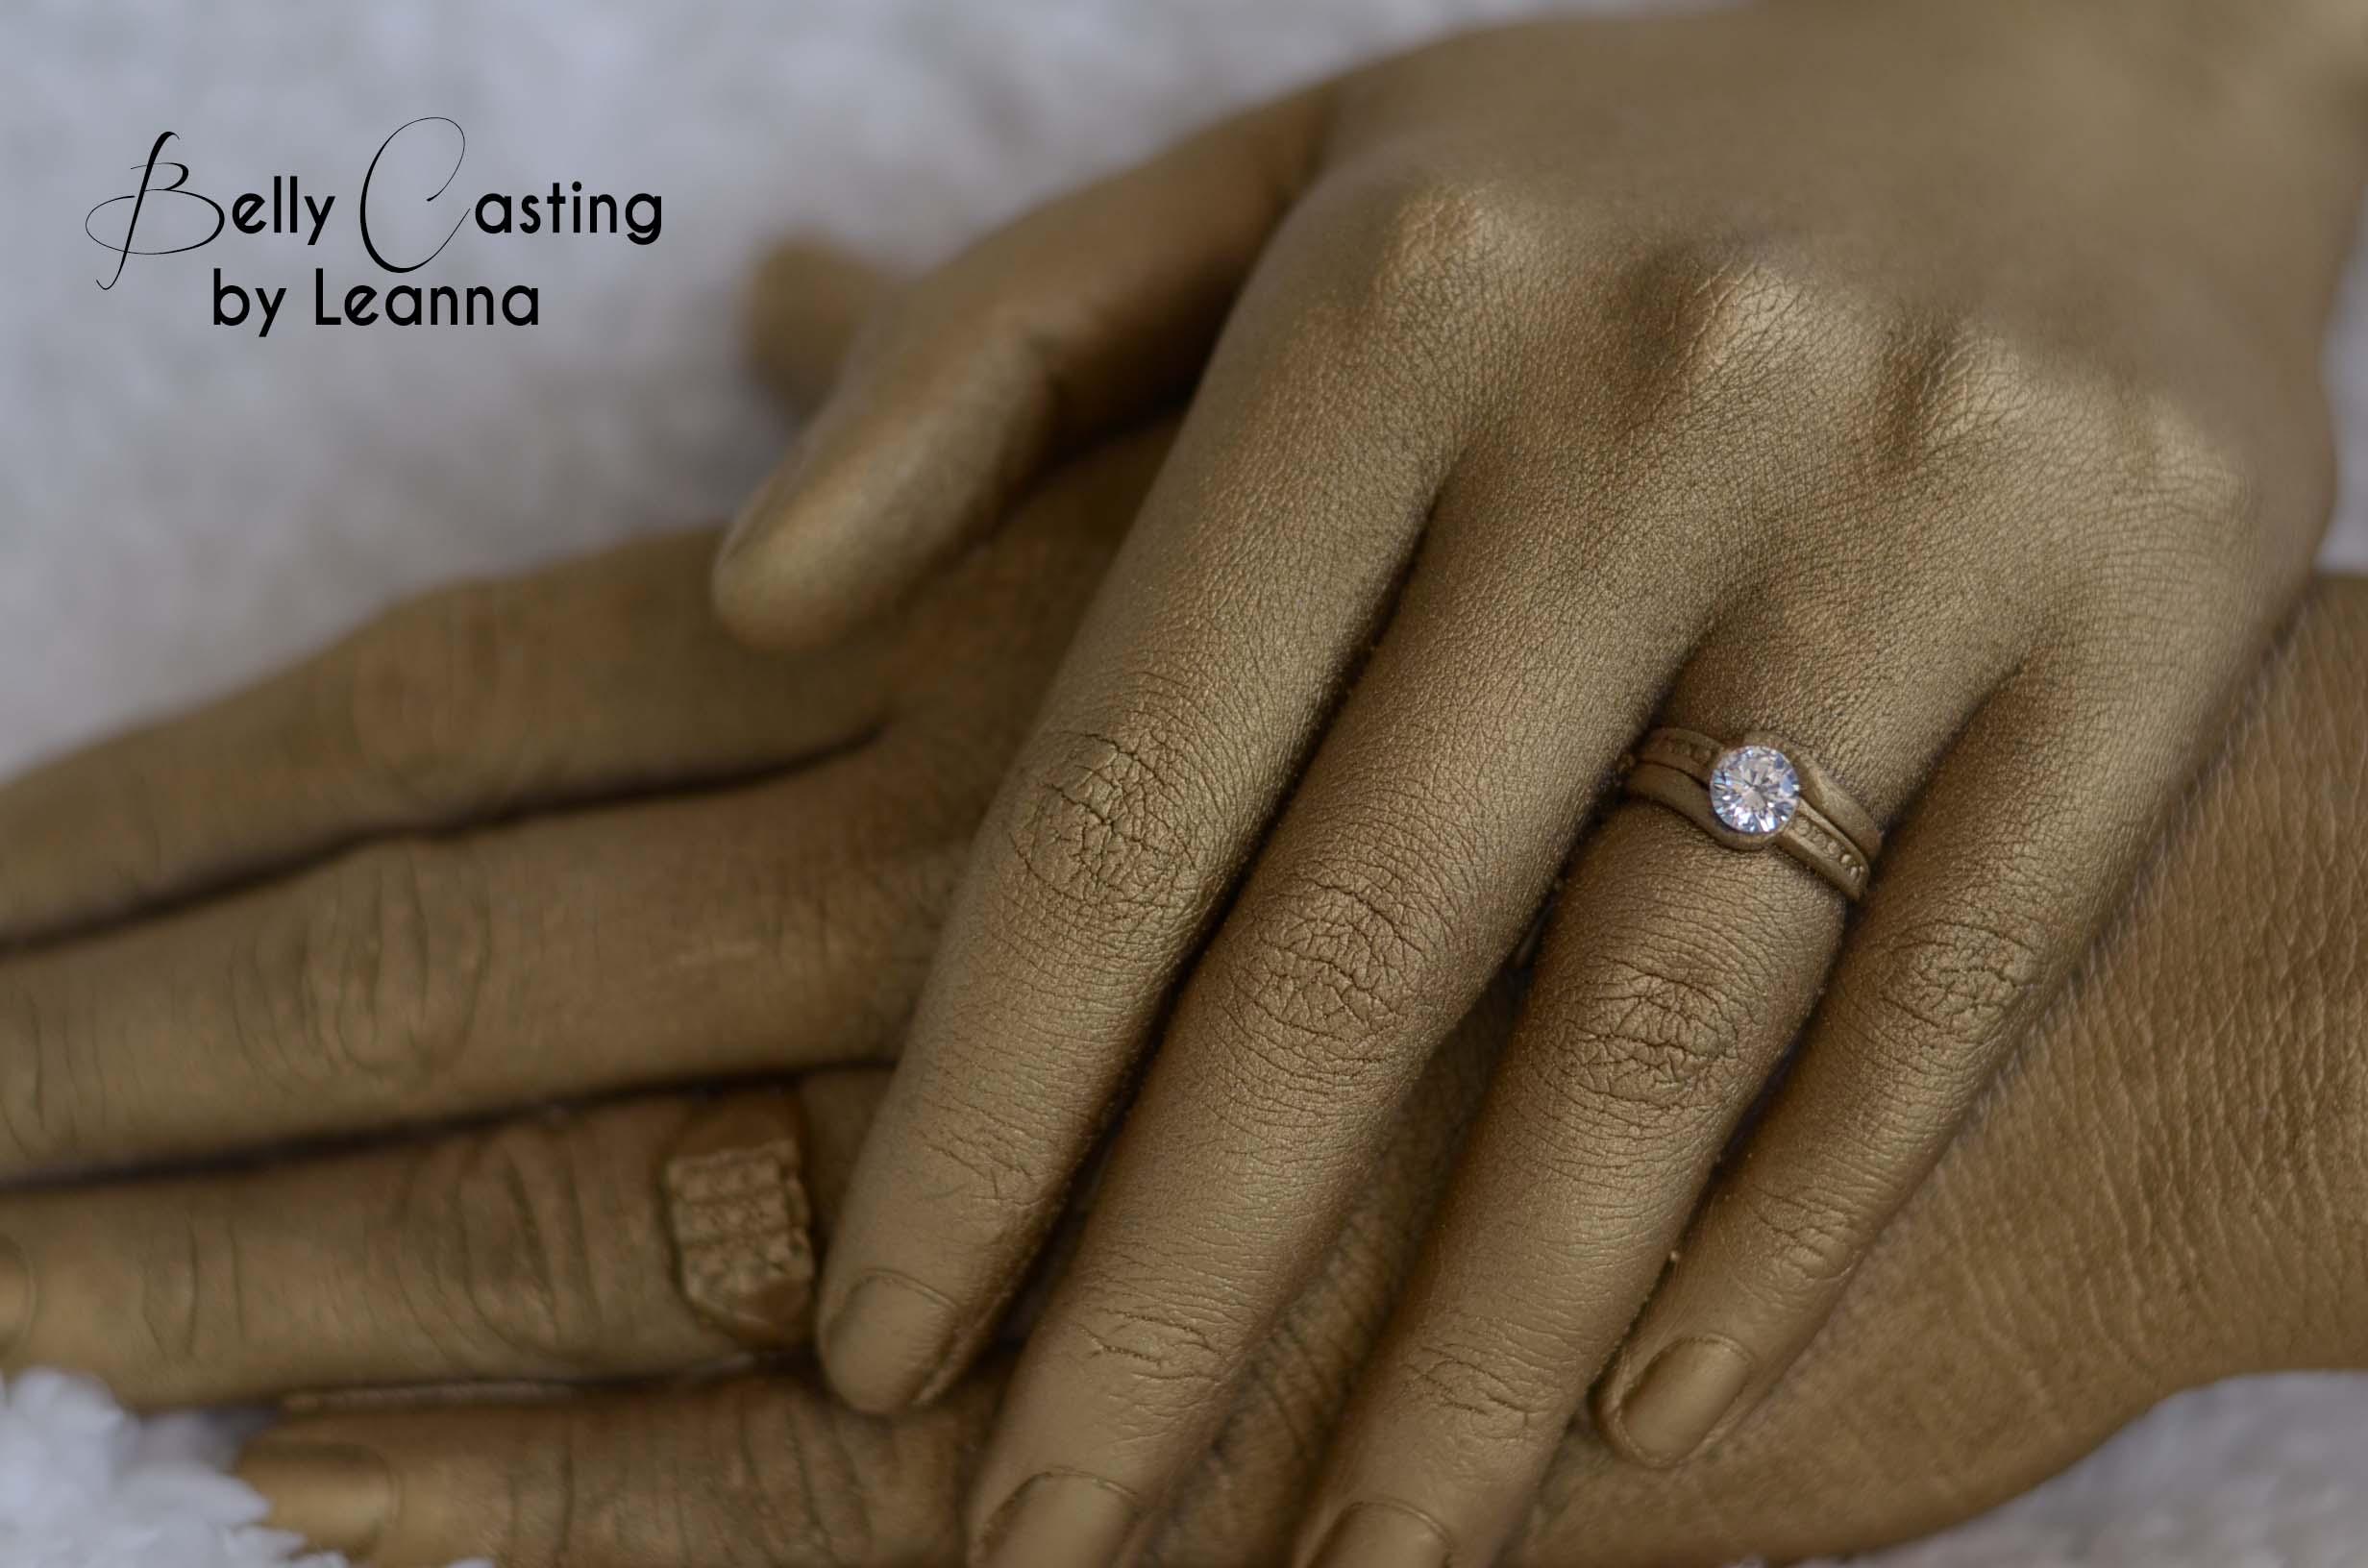 Sally's beautiful ring